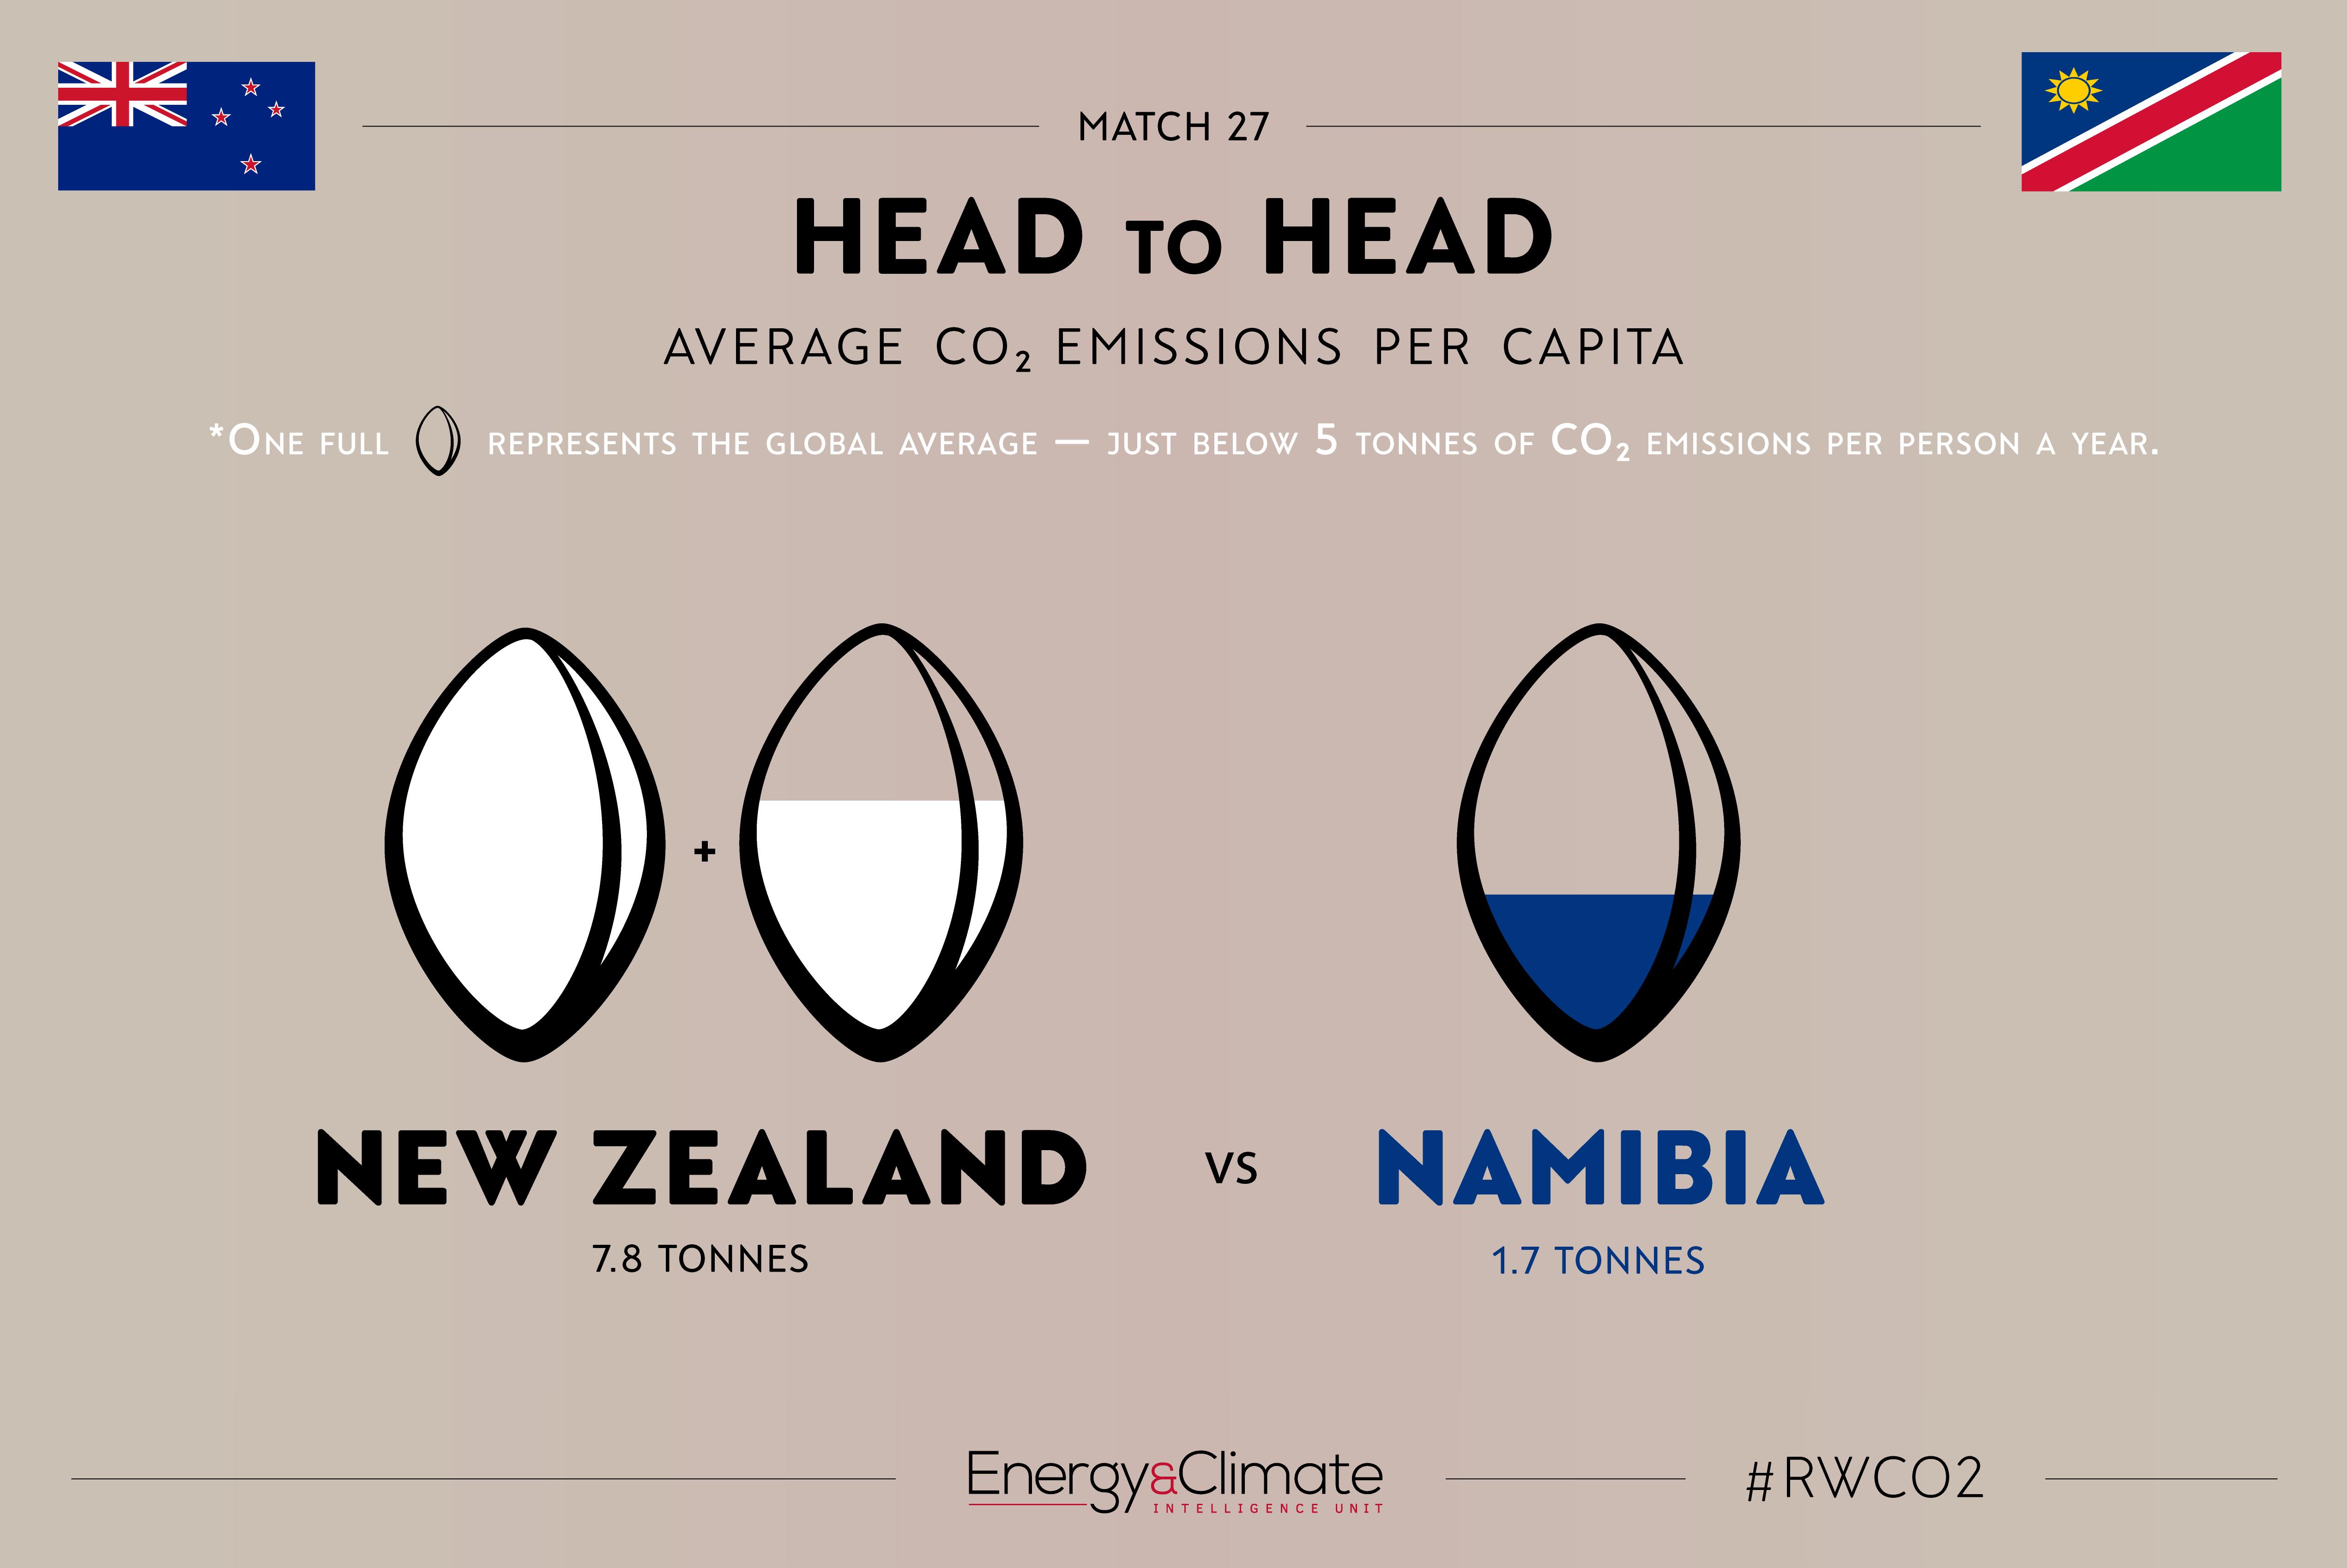 New Zealand v Namibia per capita emissions